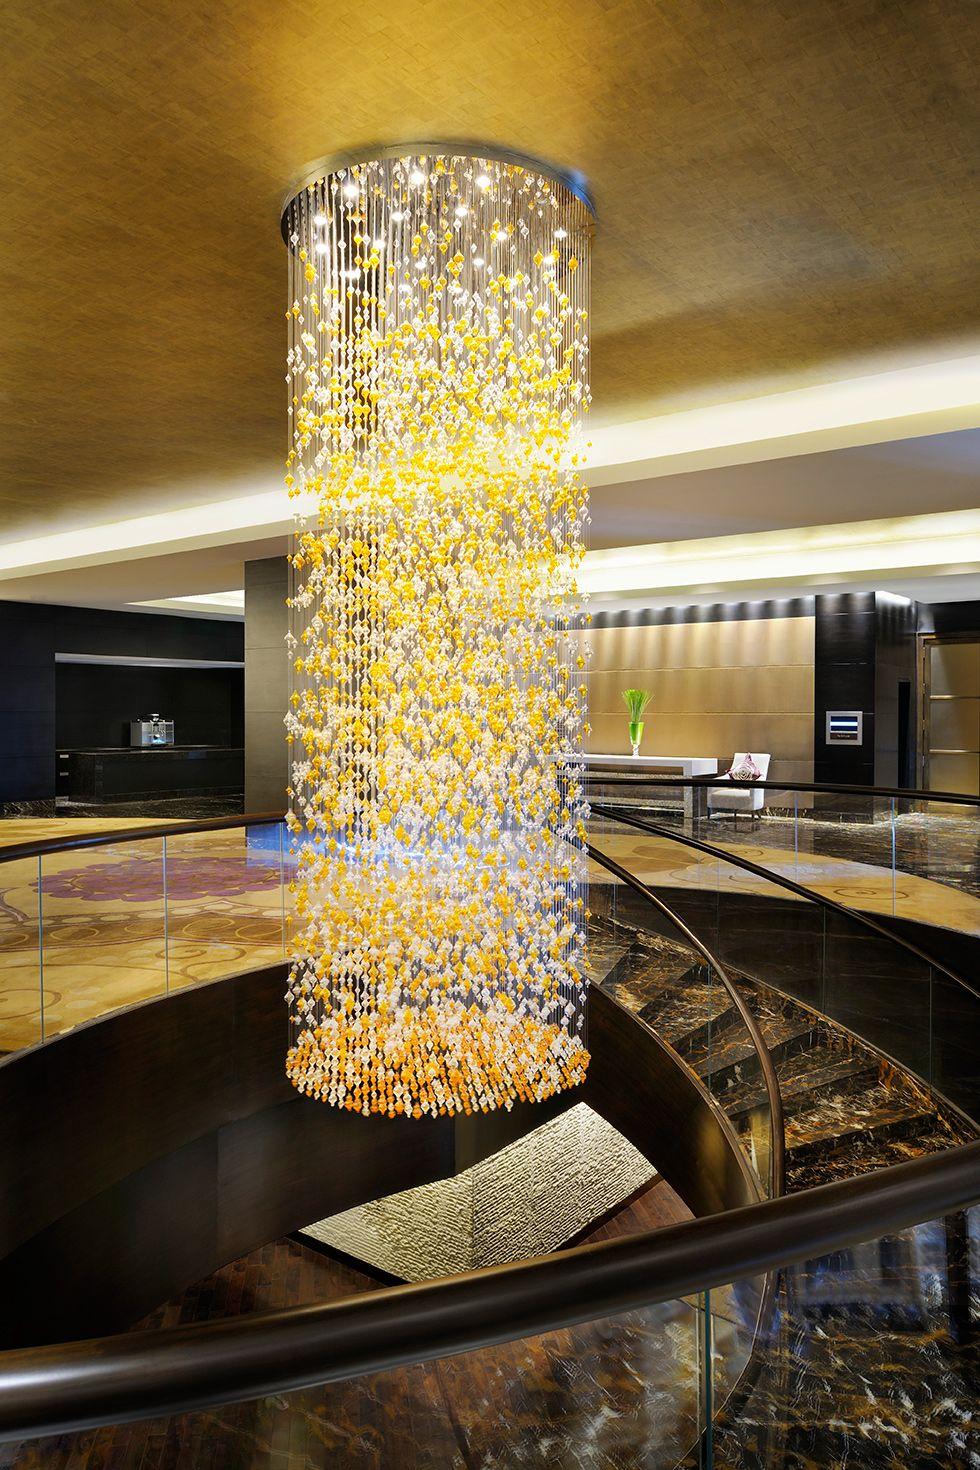 Park Hyatt Luxury 5 Star Hotel In Hyderabad India